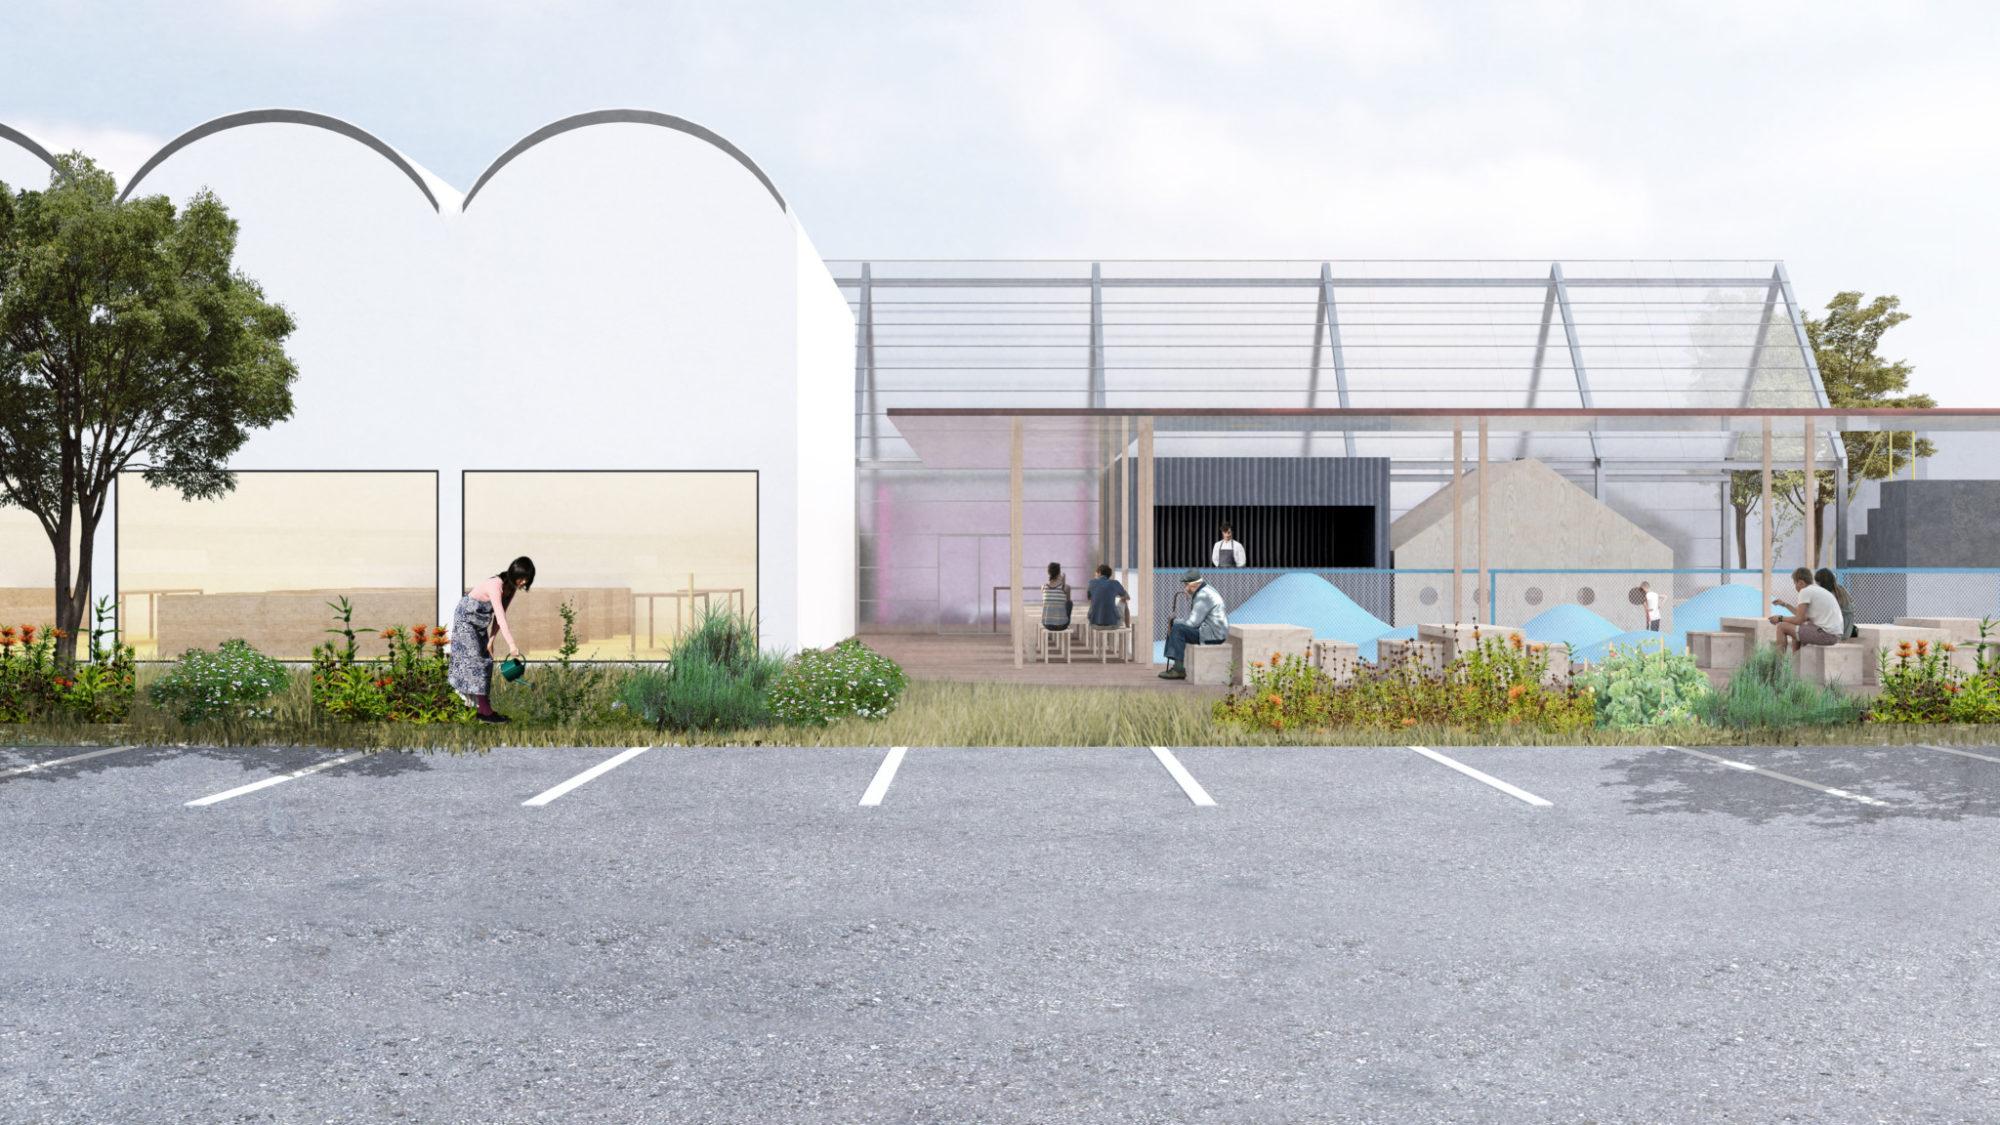 Kitago Michi no eki Proposal roadside station by mosaic design 北郷 道の駅 プロポーザル by モザイクデザイン